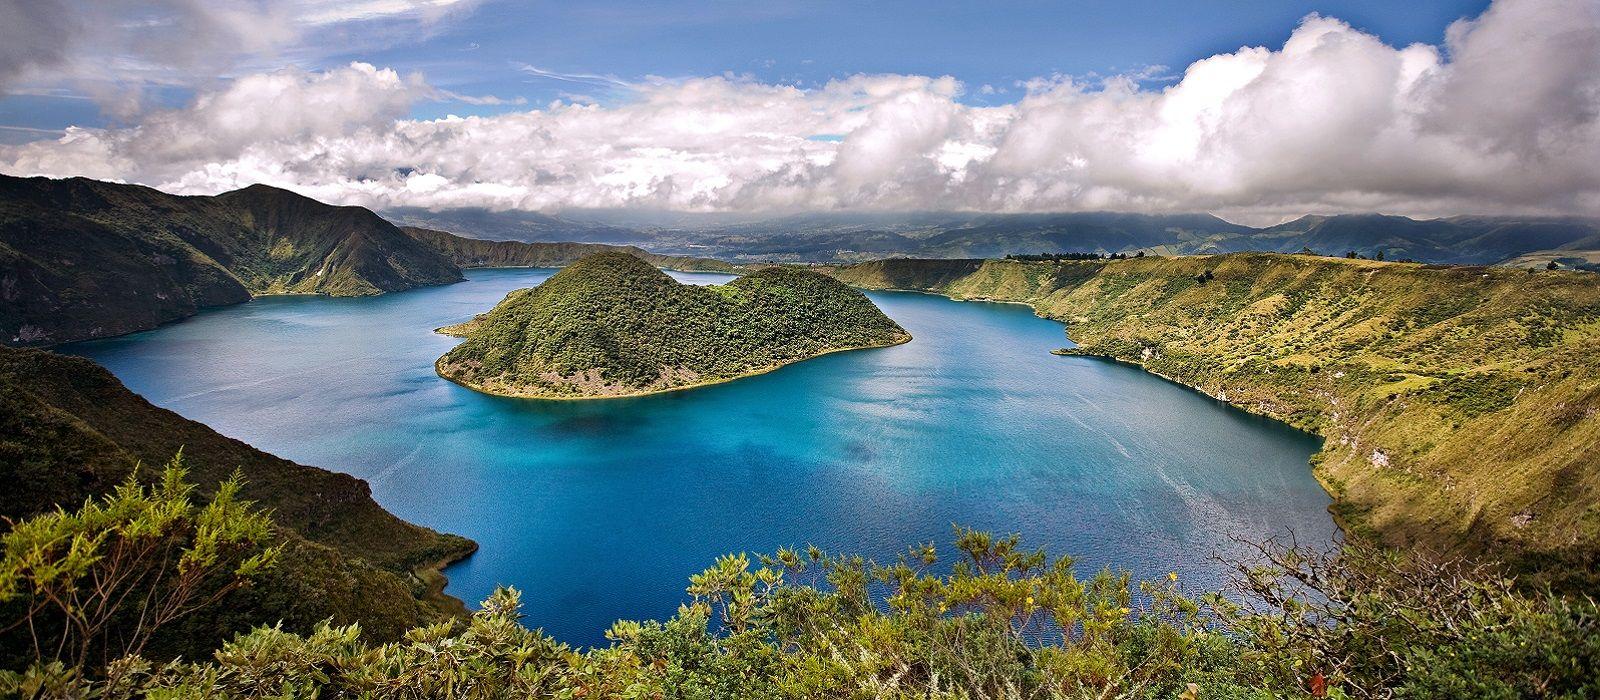 Ecuador: Galapagos, Traditions & Chocolate Tour Trip 1